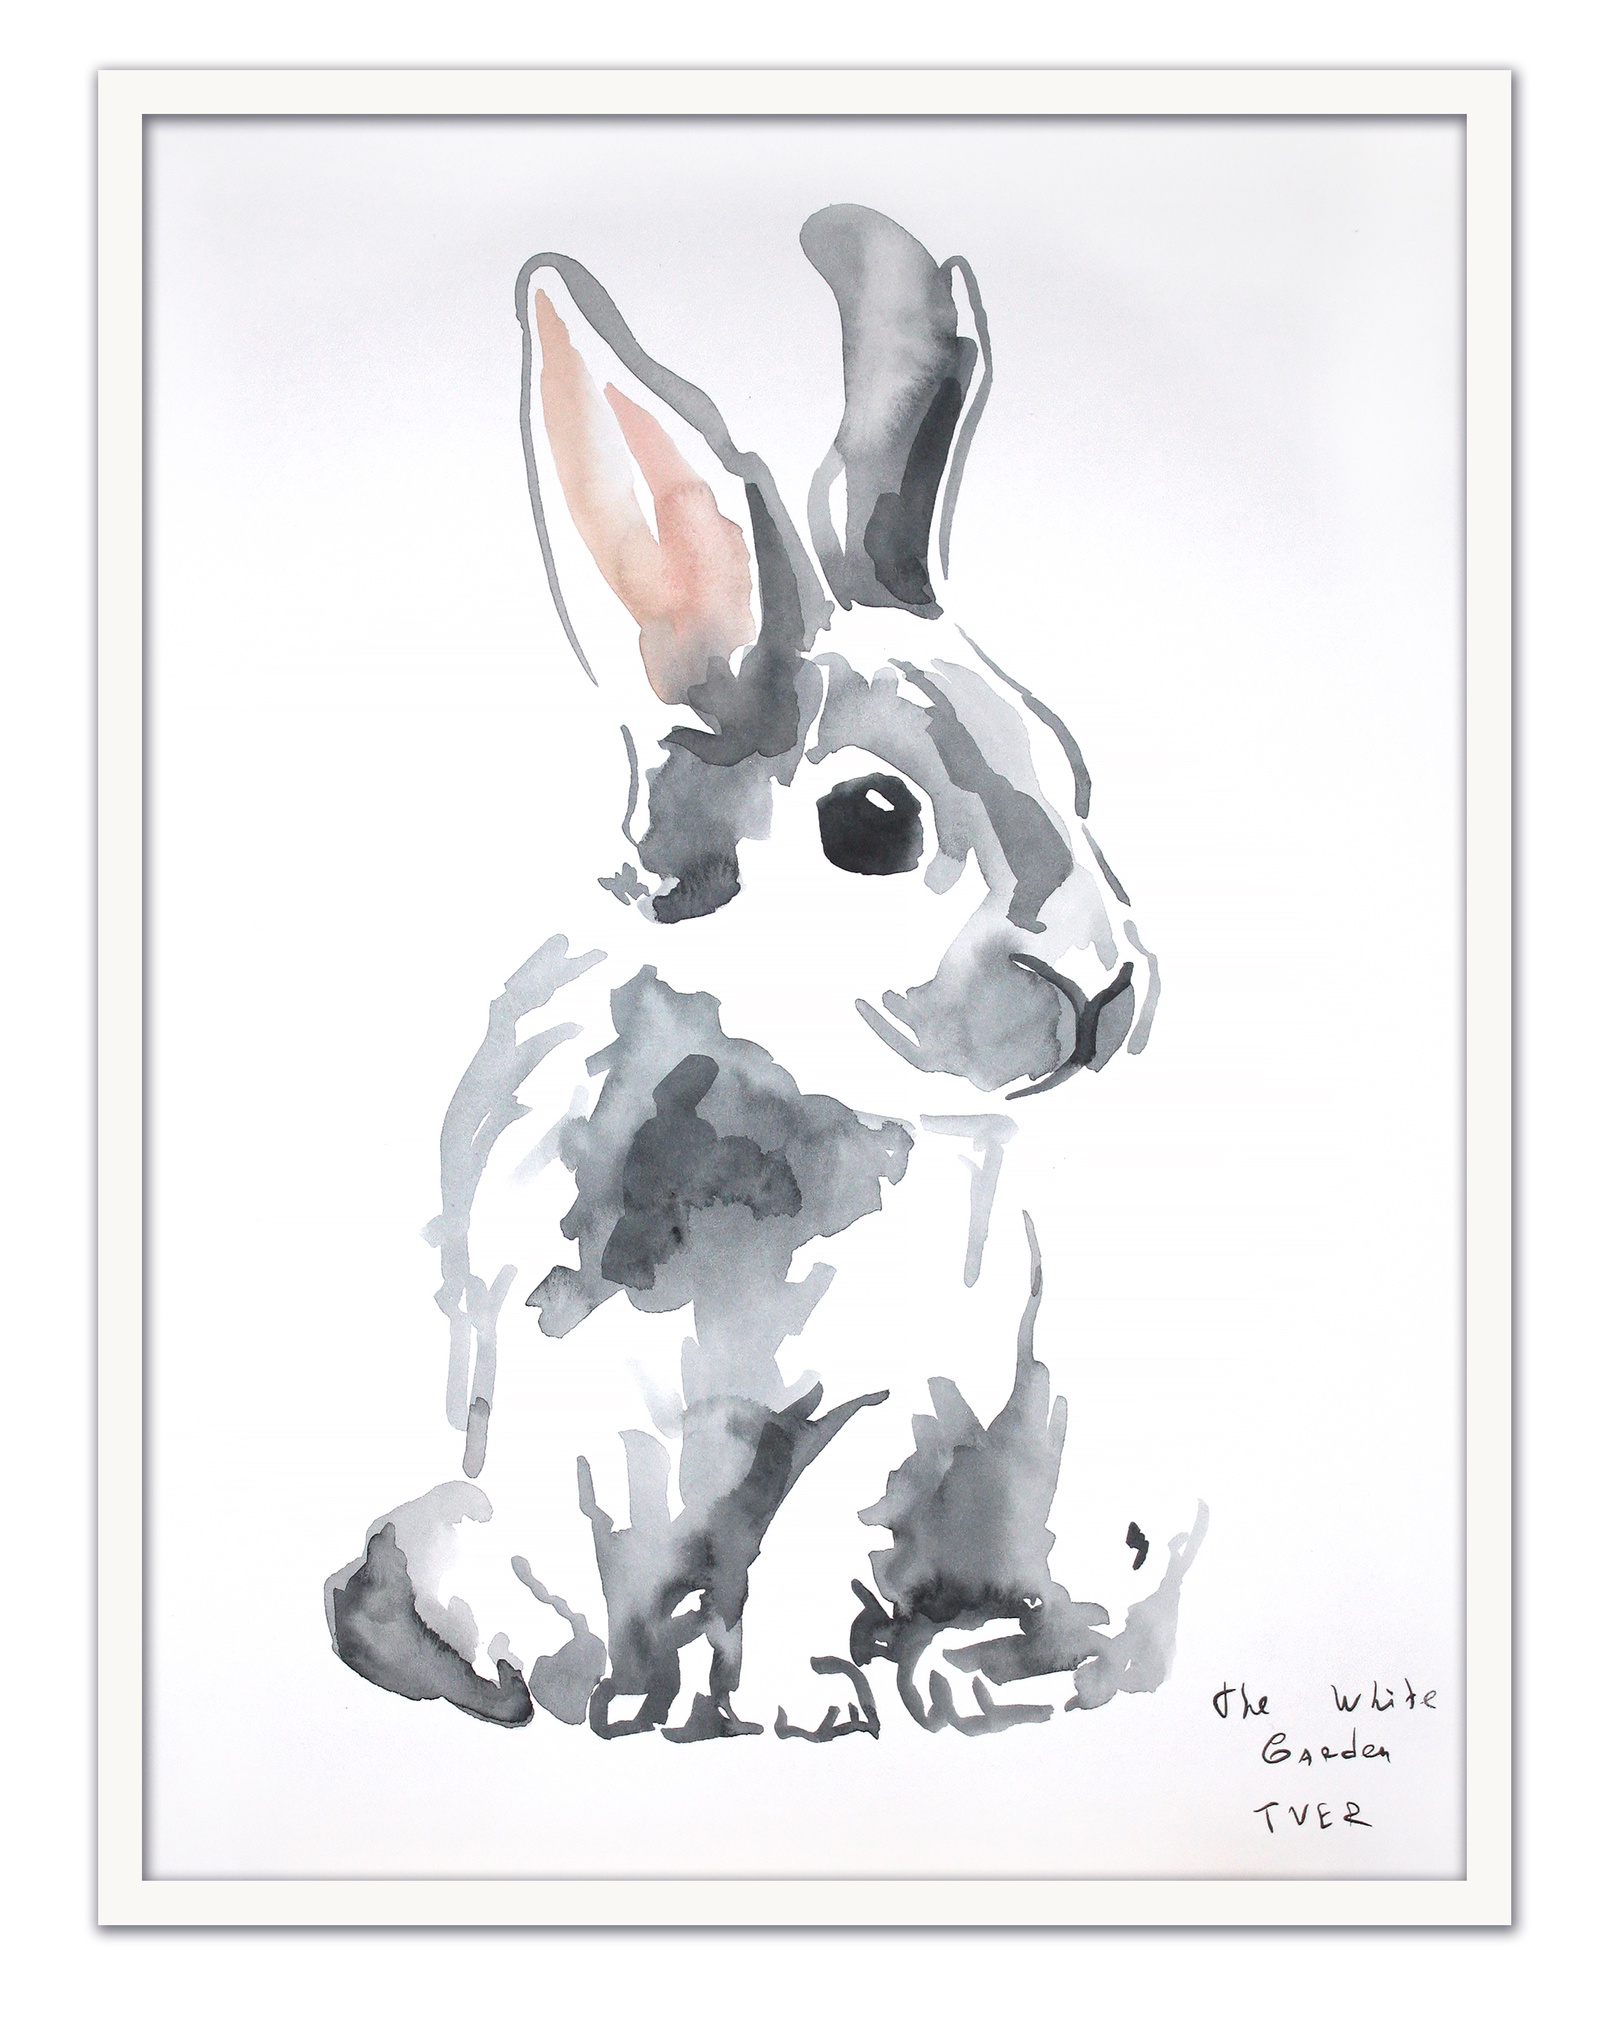 Картина The White Garden TVER кролик, белый, серый картина фото